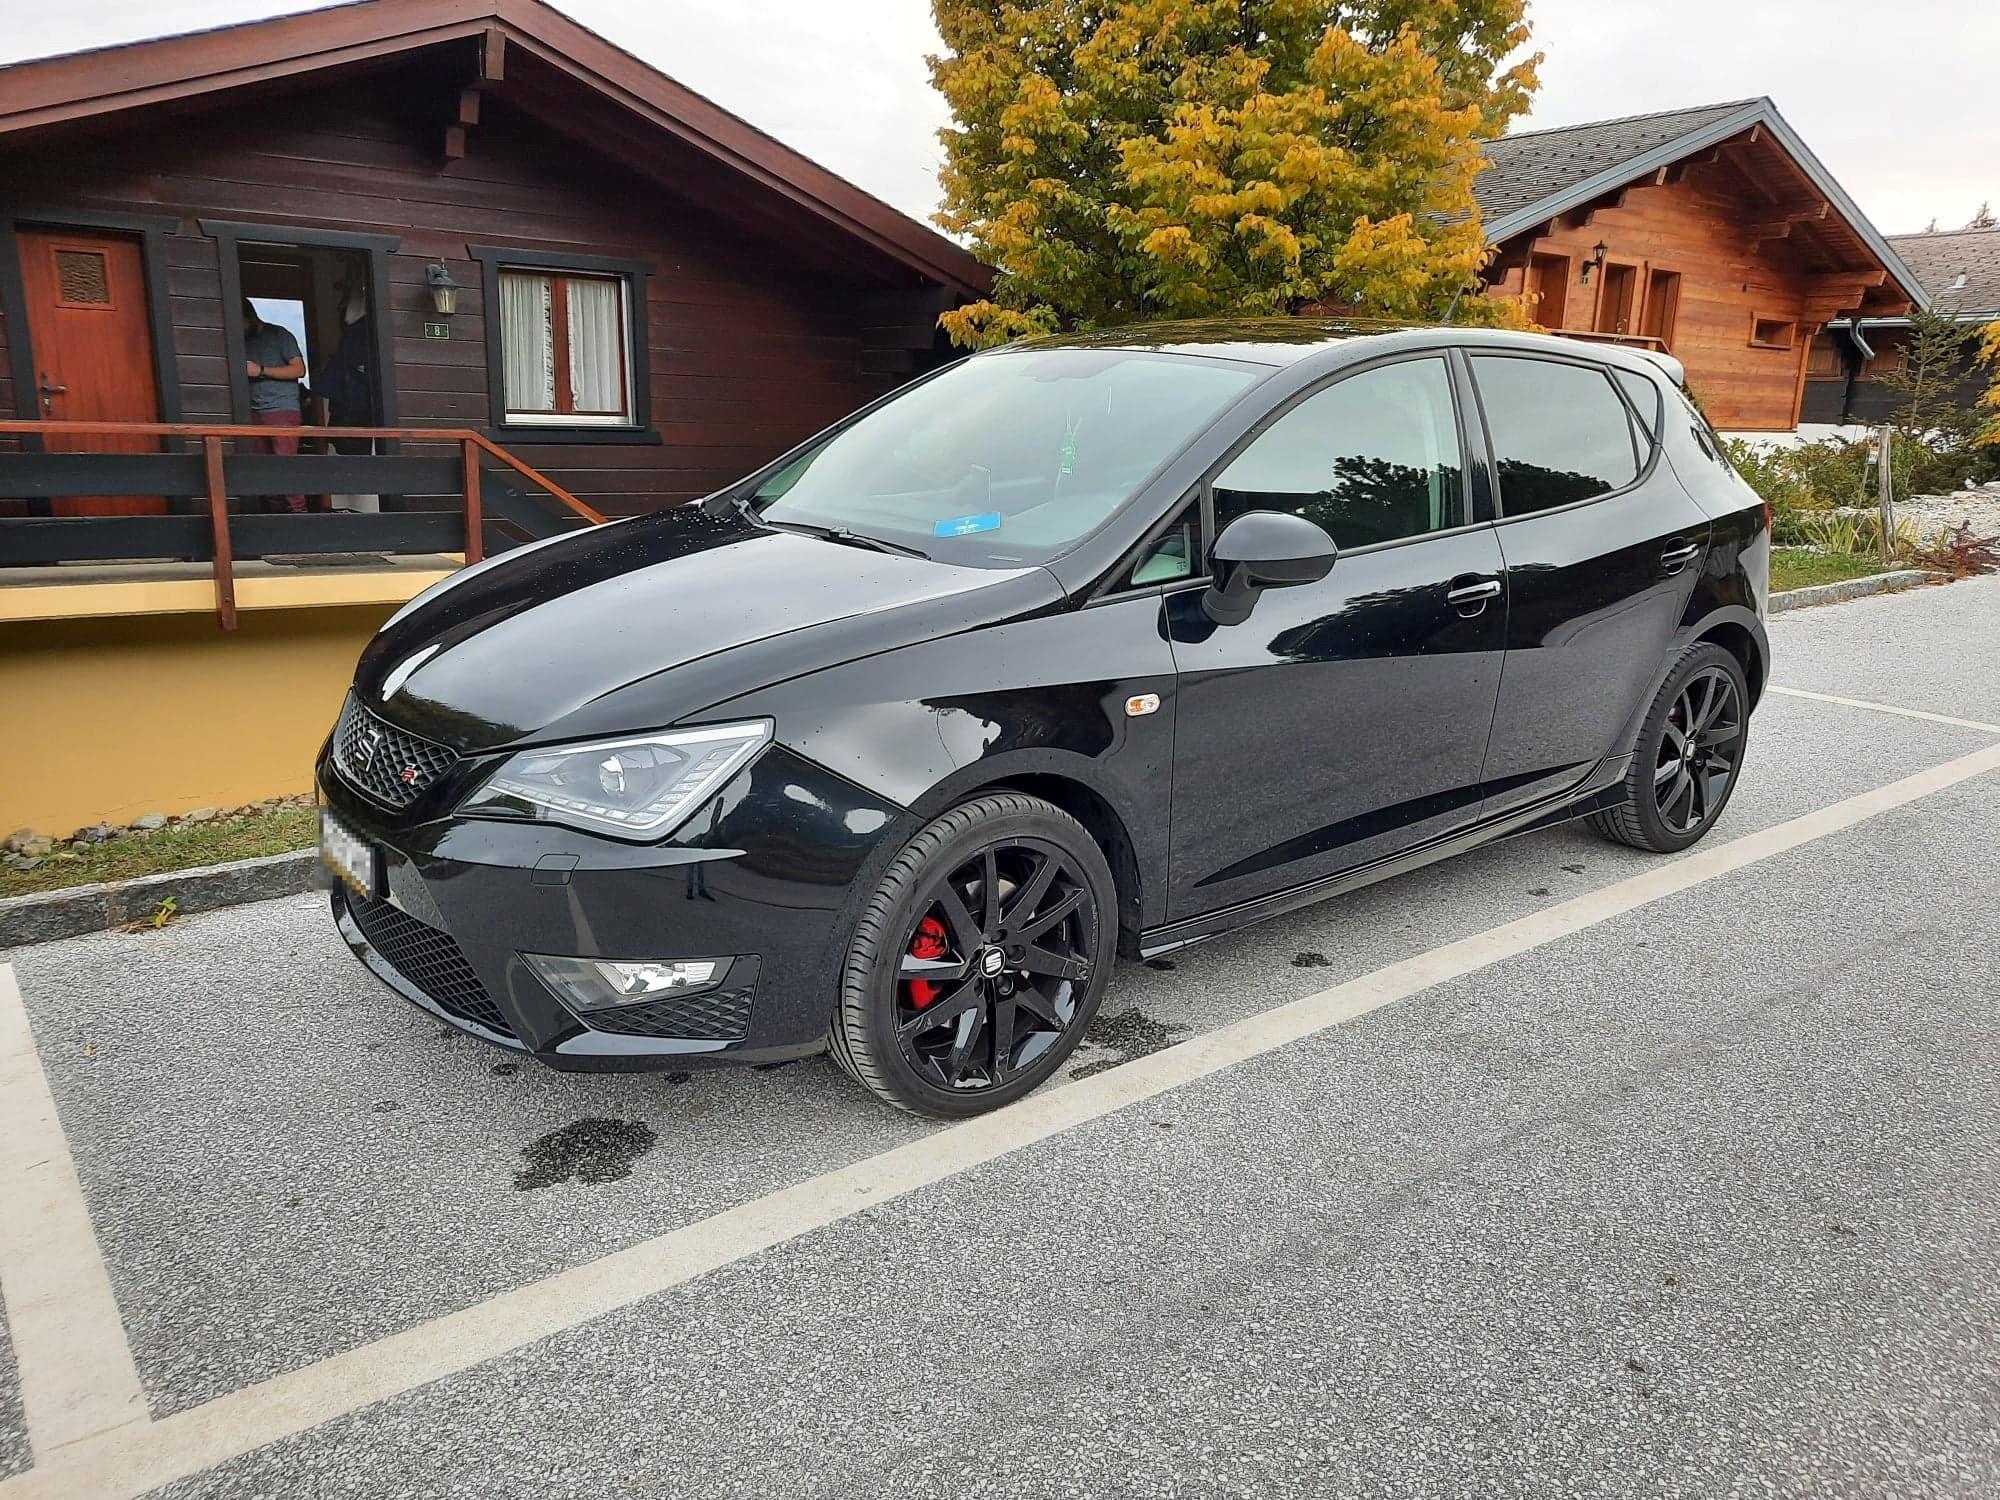 SEAT Ibiza 1.4 TSI 140 ACT FR 30 S/S